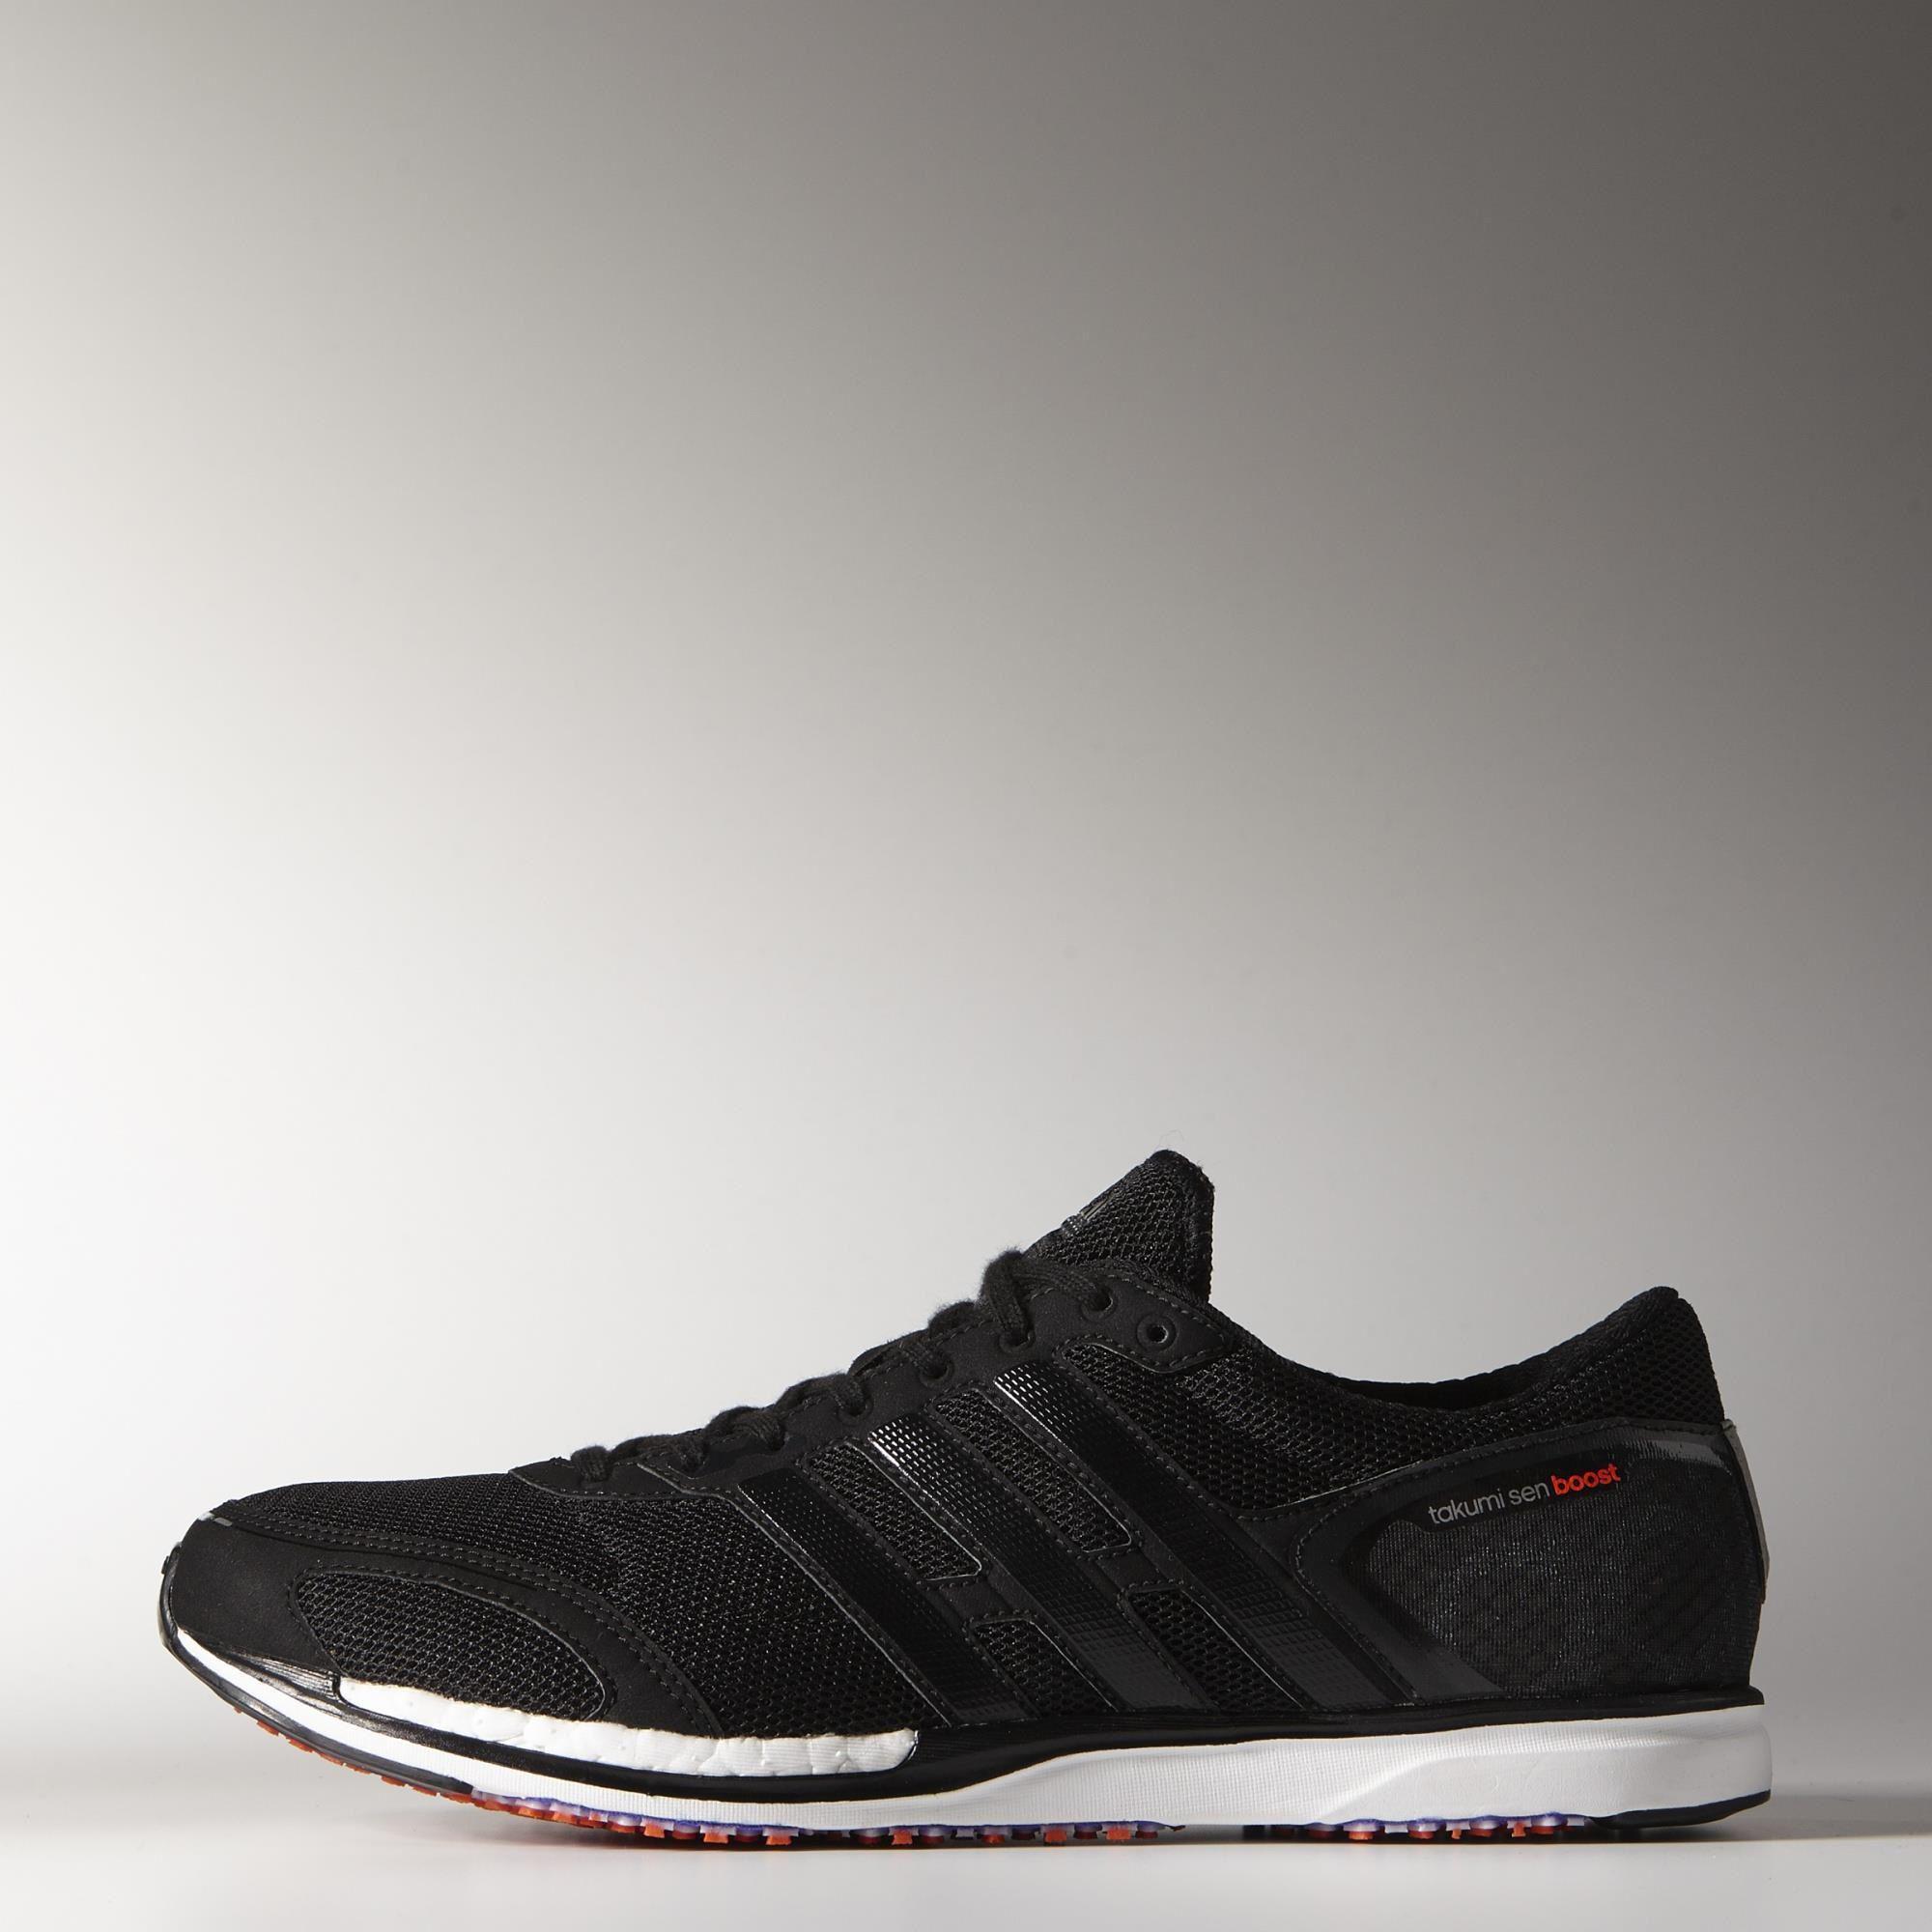 the best attitude b968f d5896 Adidas Mens Adizero Takumi Sen Boost 3 Running Shoes - BlackWhite -  Tennisnuts.com